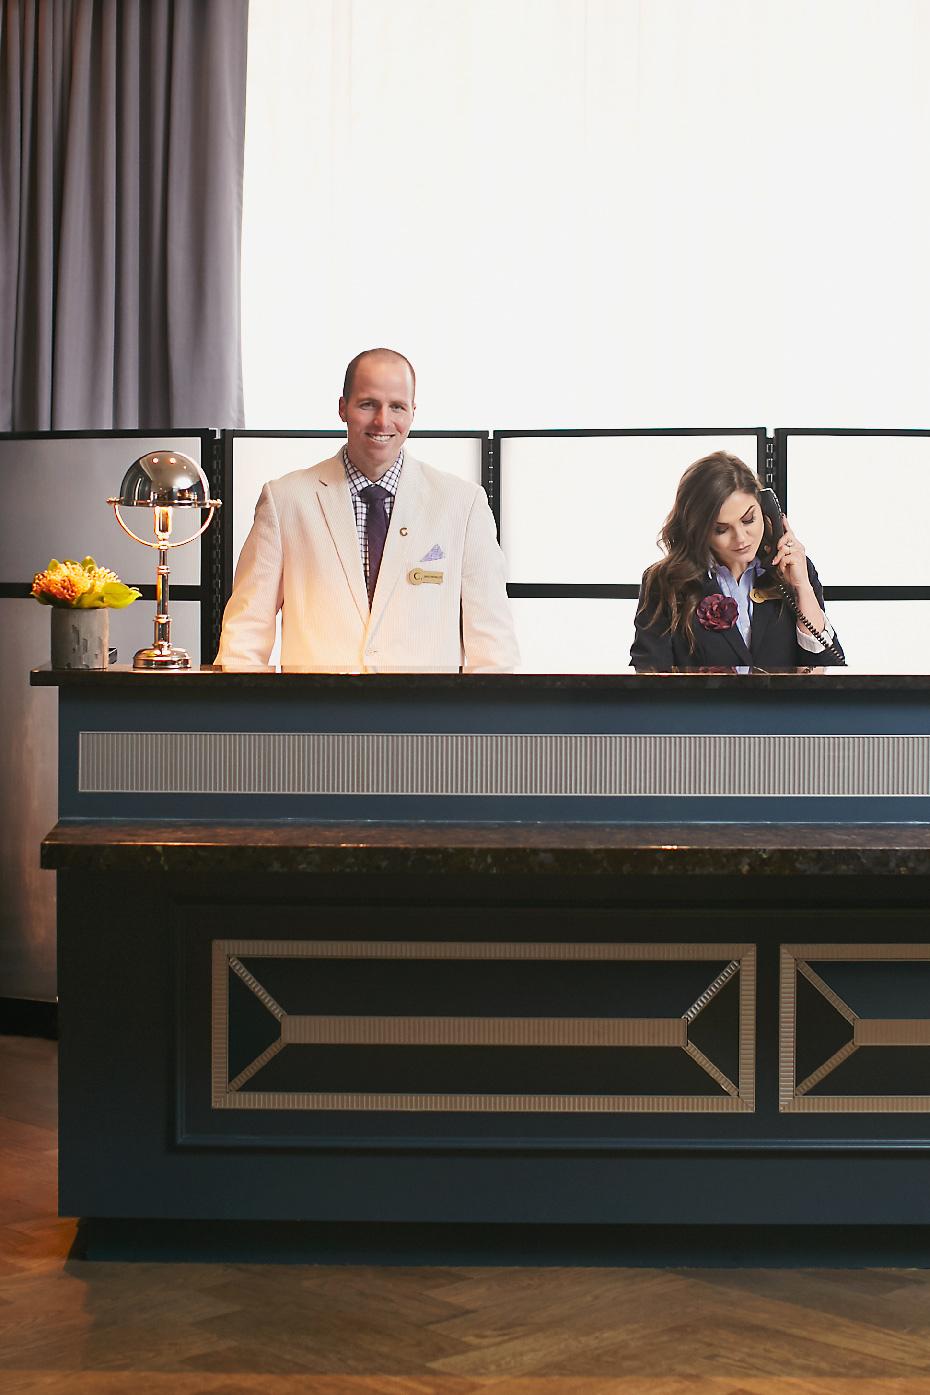 Stacey Van Berkel Photography I Reception desk at the Cardinal Hotel I Kimpton Hotel I Pet friendly hotel I Winston-Salem, North Carolina